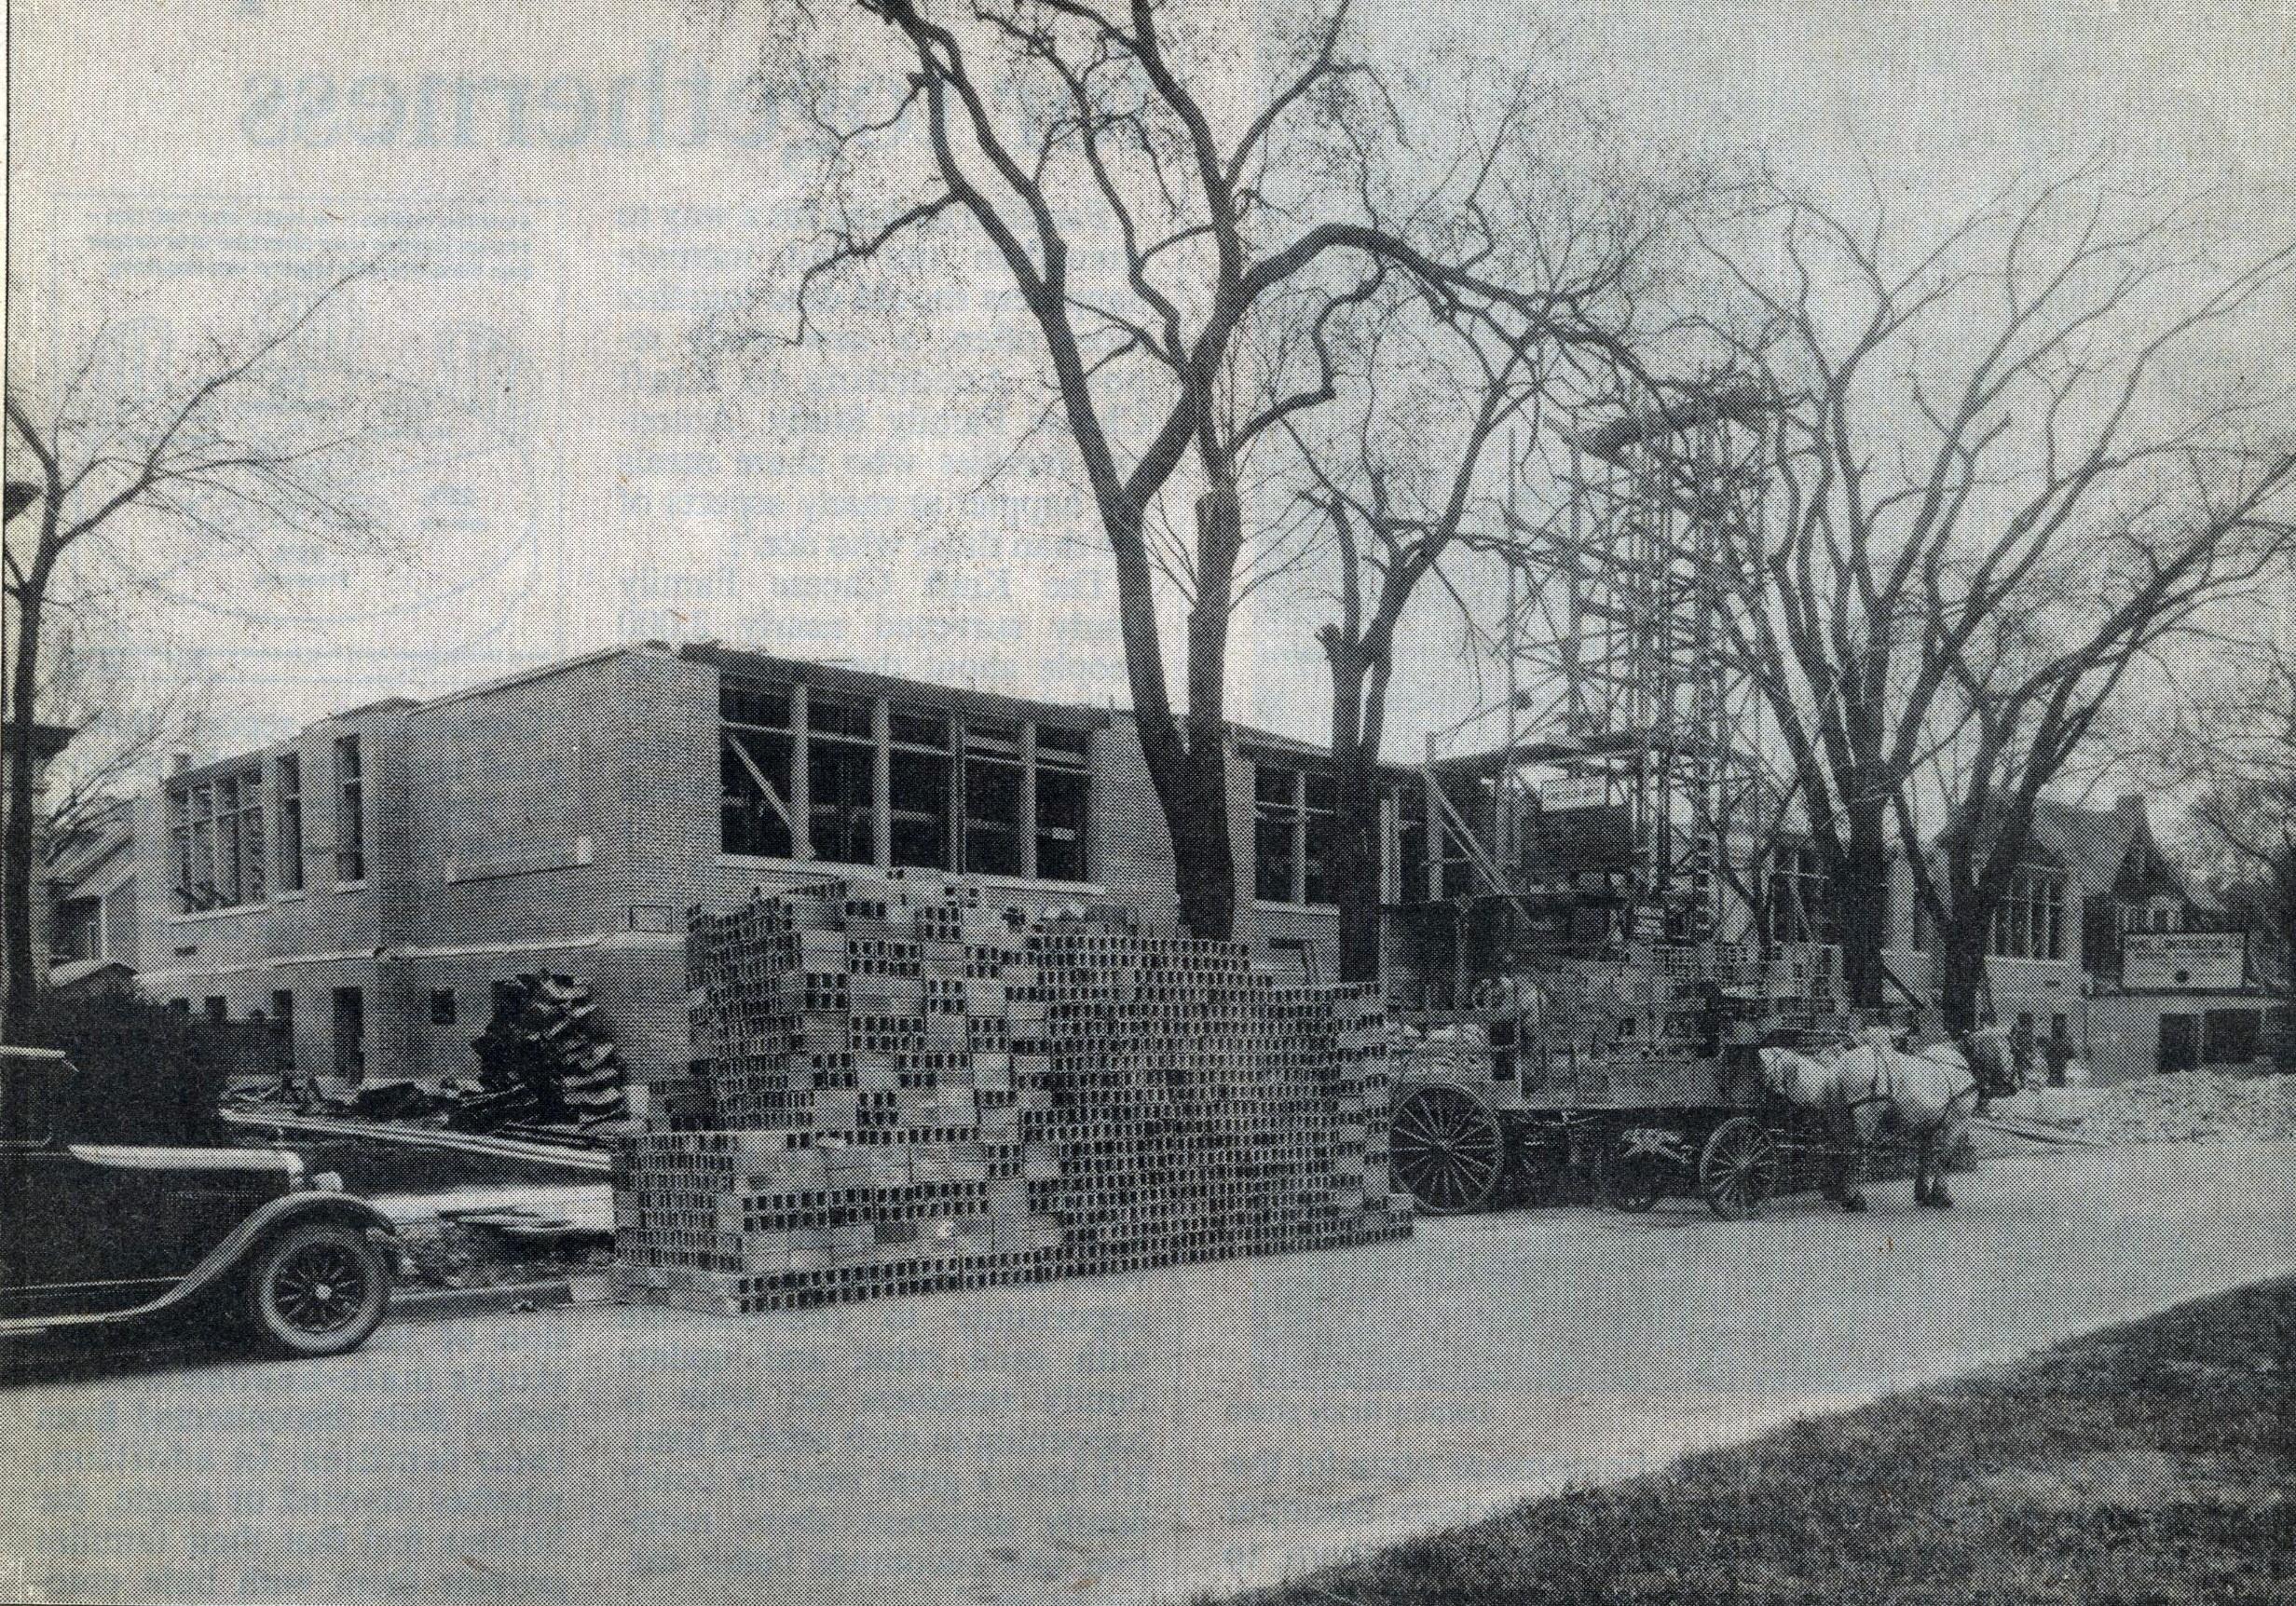 Construction on St. Joseph's School, May 15, 1928.